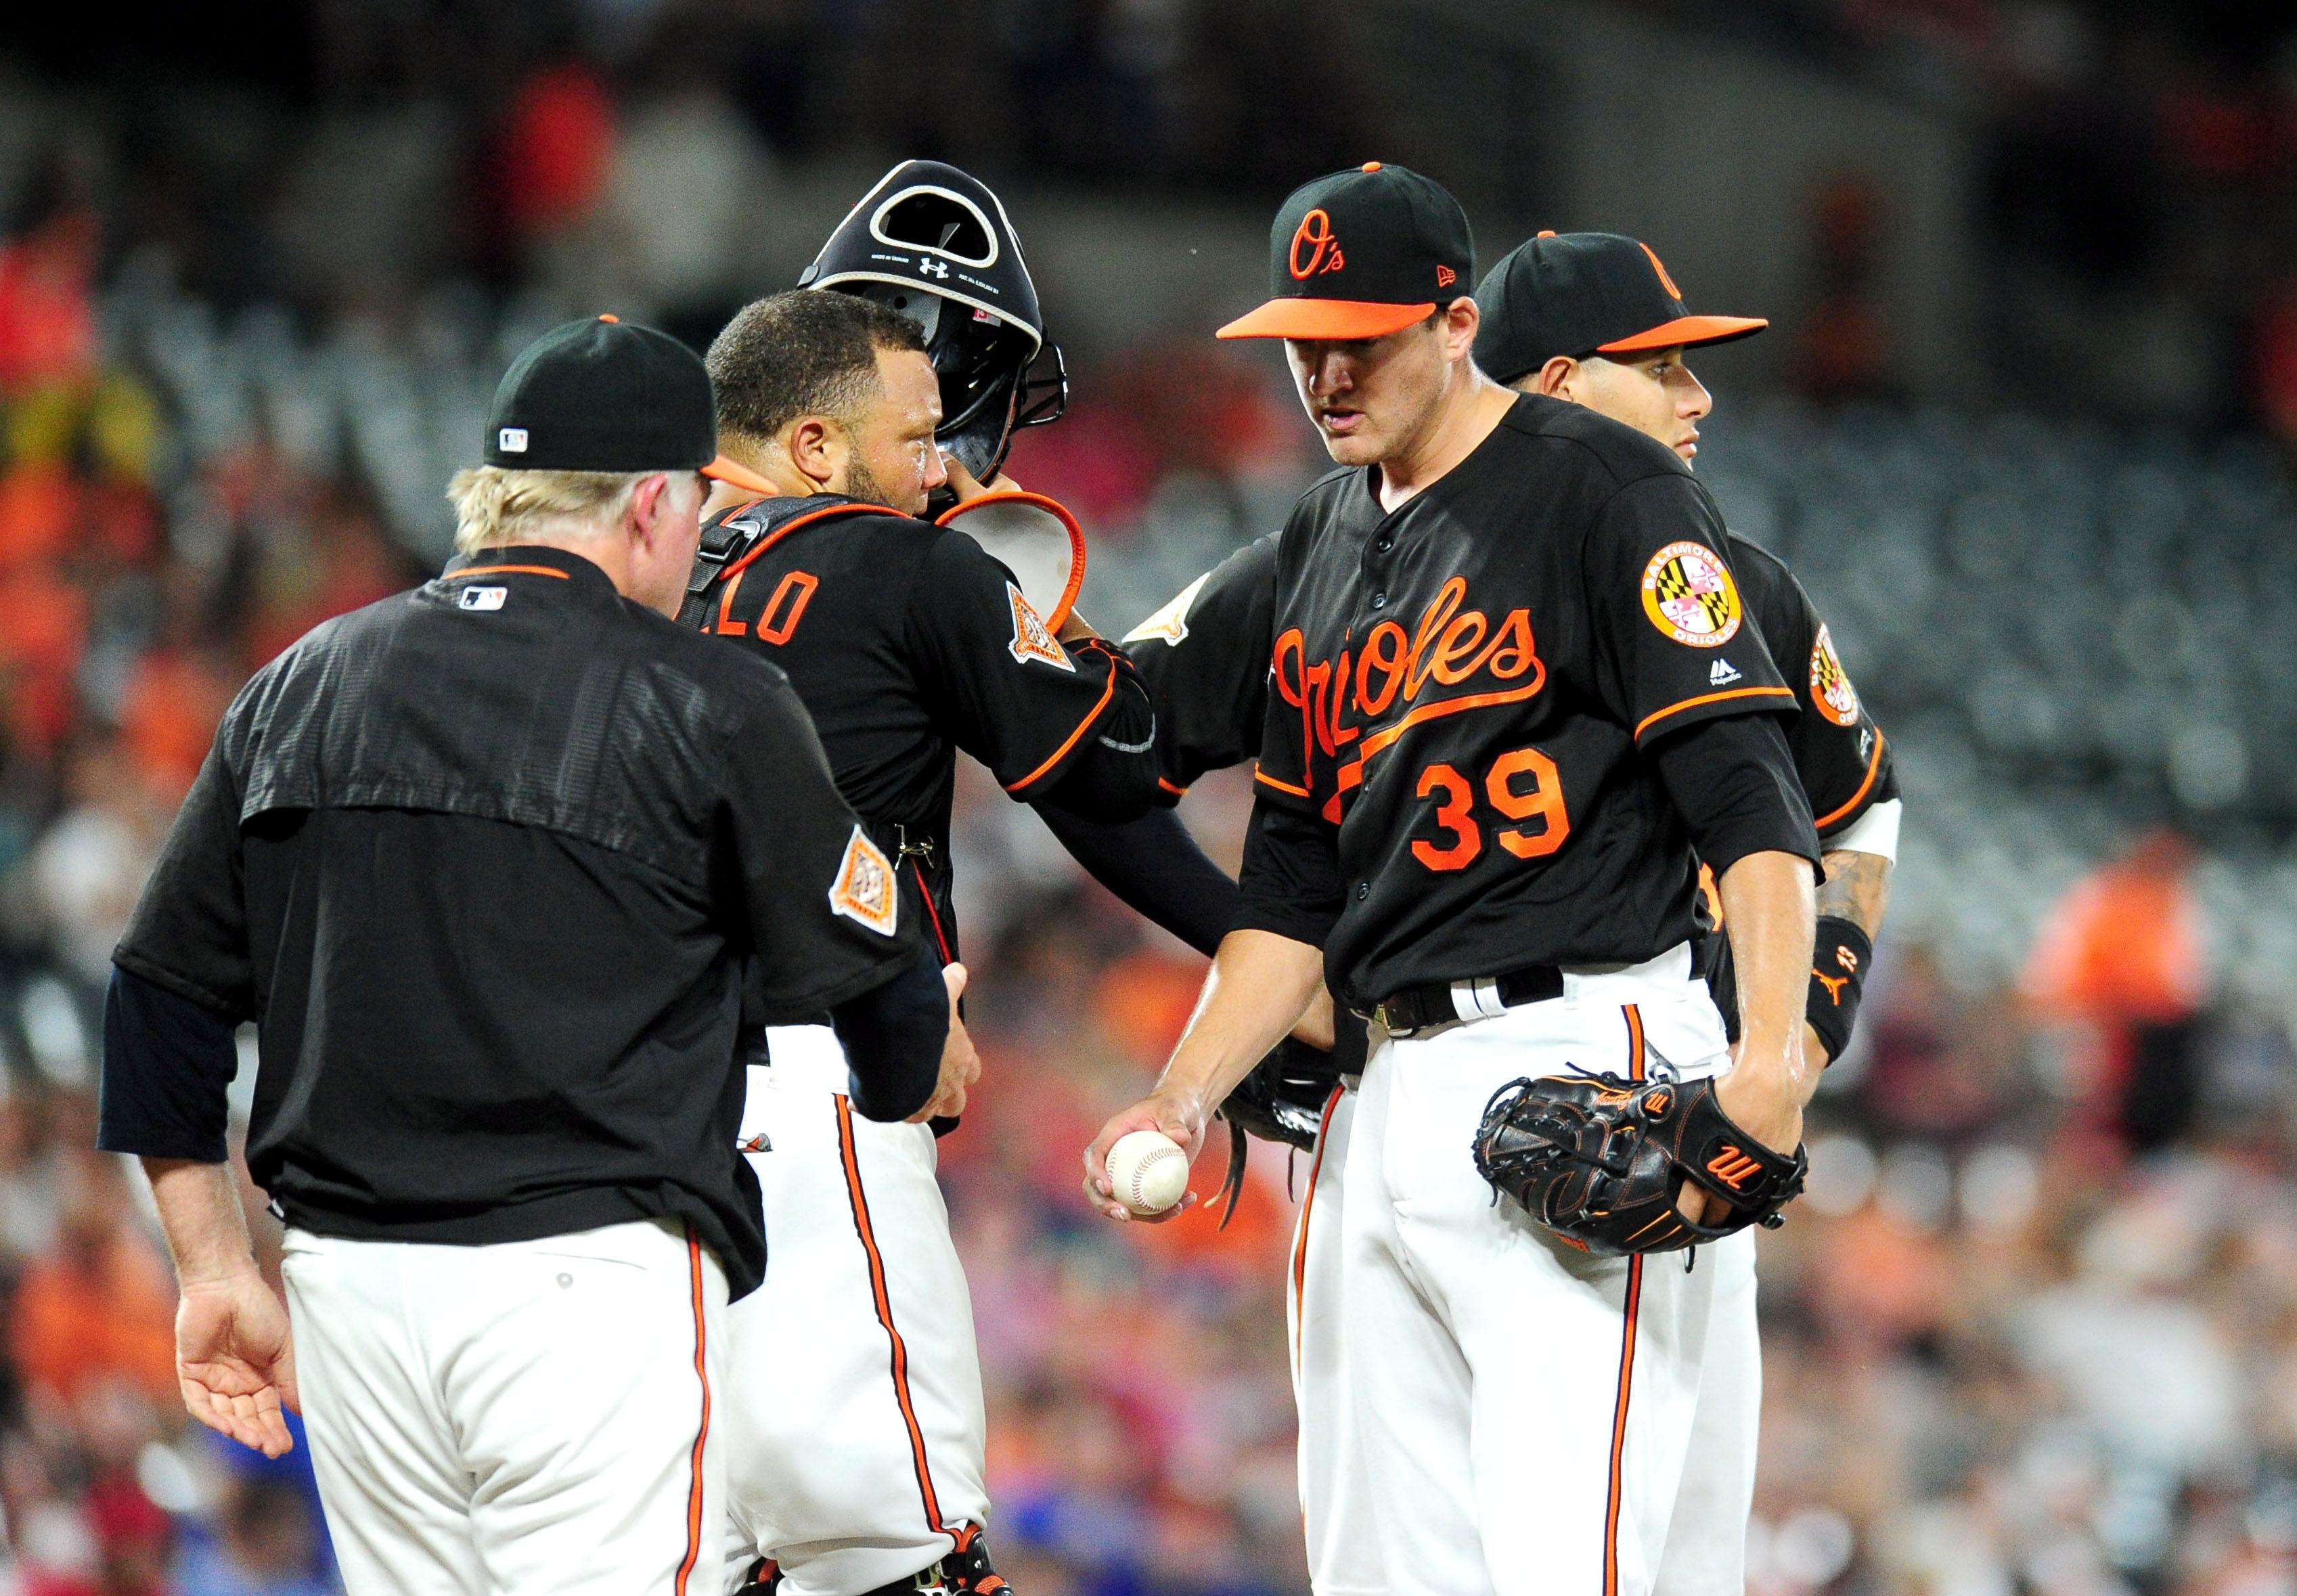 MLB: St. Louis Cardinals at Baltimore Orioles